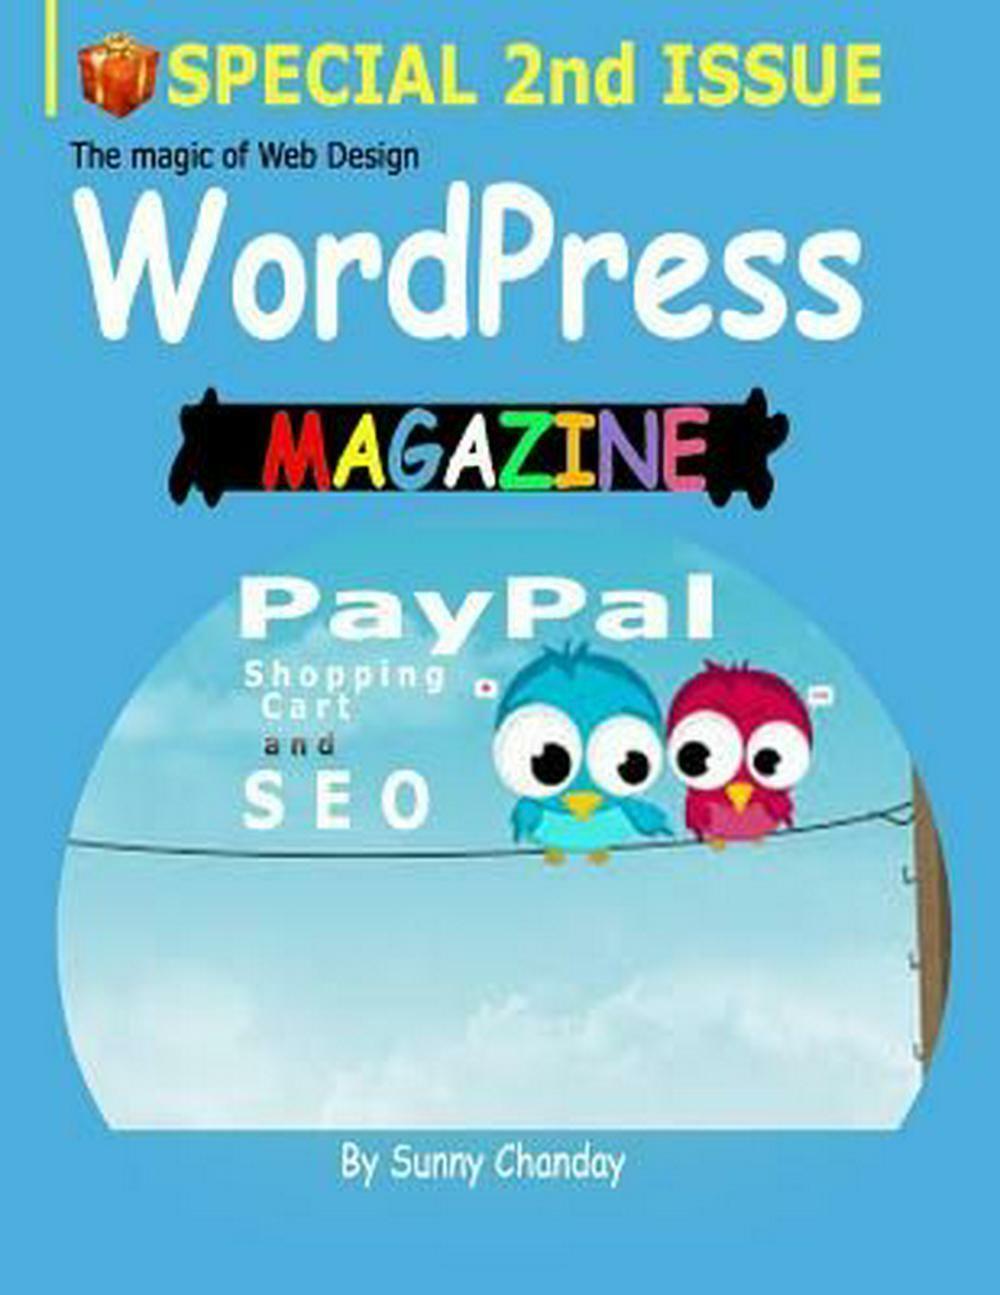 Wordpress Magazine: Paypal Shopping Cart & Seo by Sunny Chanday (English) Paperb